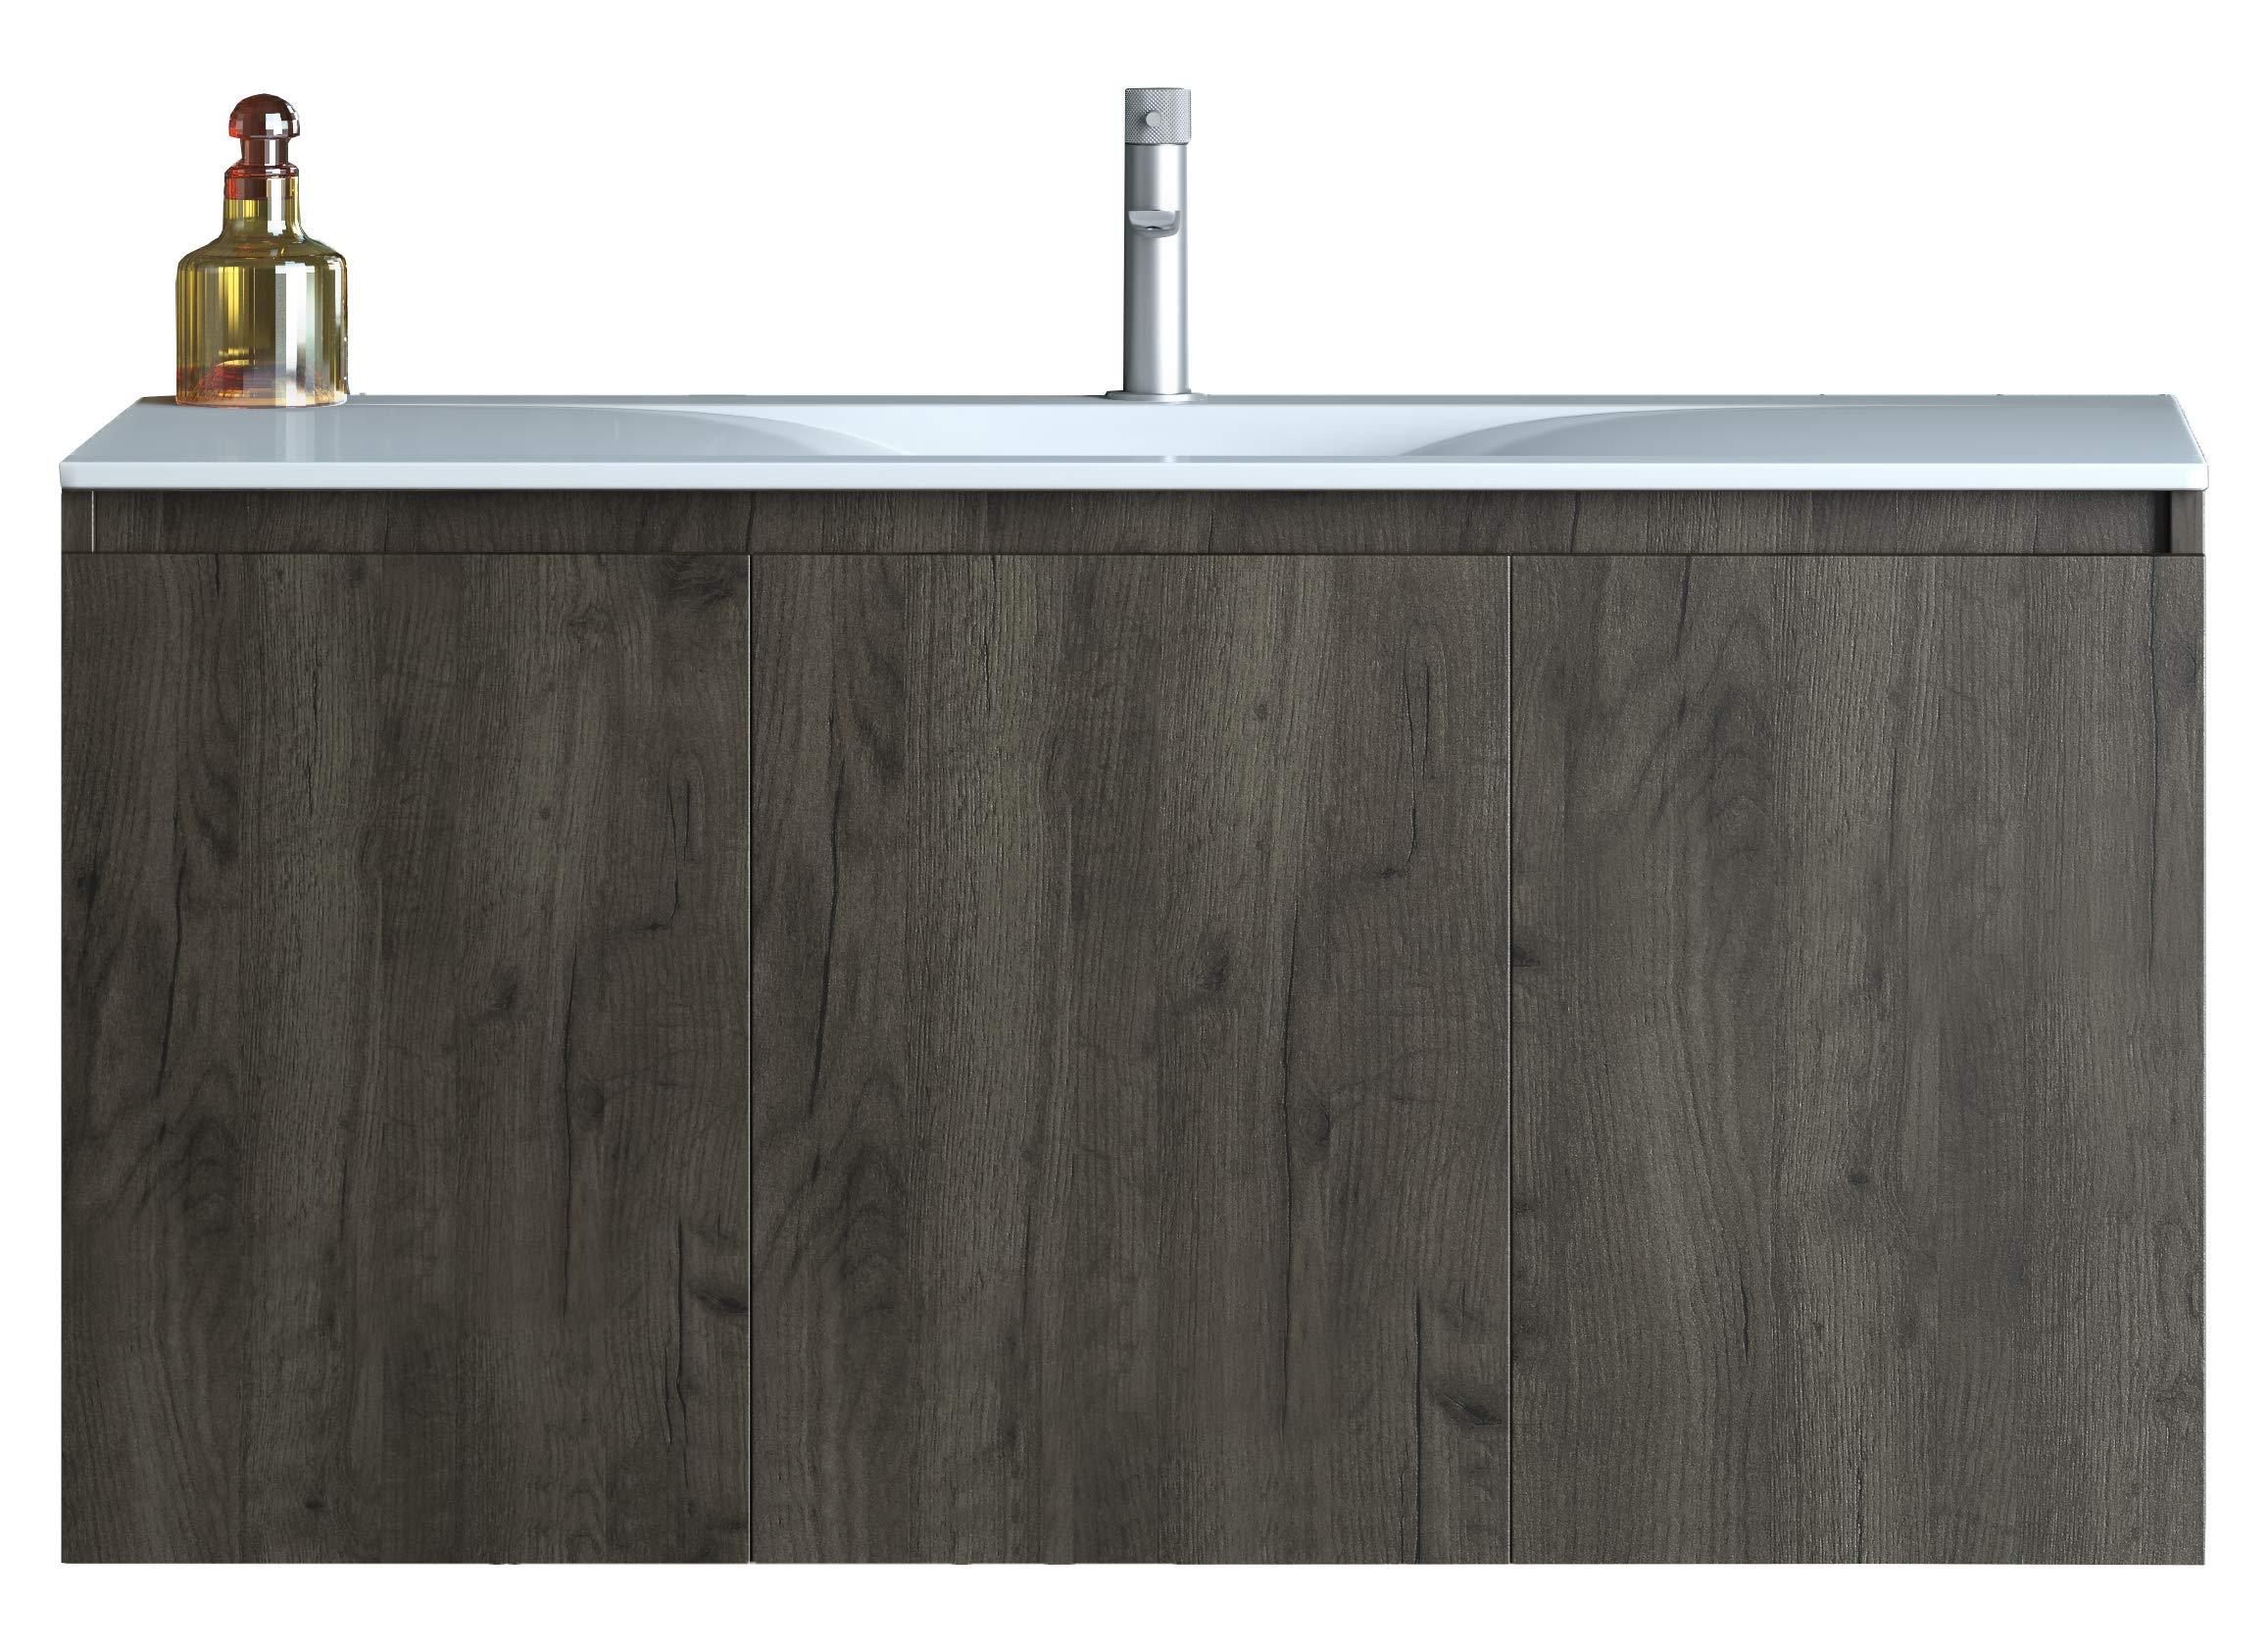 belvedere bath floating bathroom vanity wall mounted sink countertop combo set natural walnut brown finish with white porcelain top 3 door